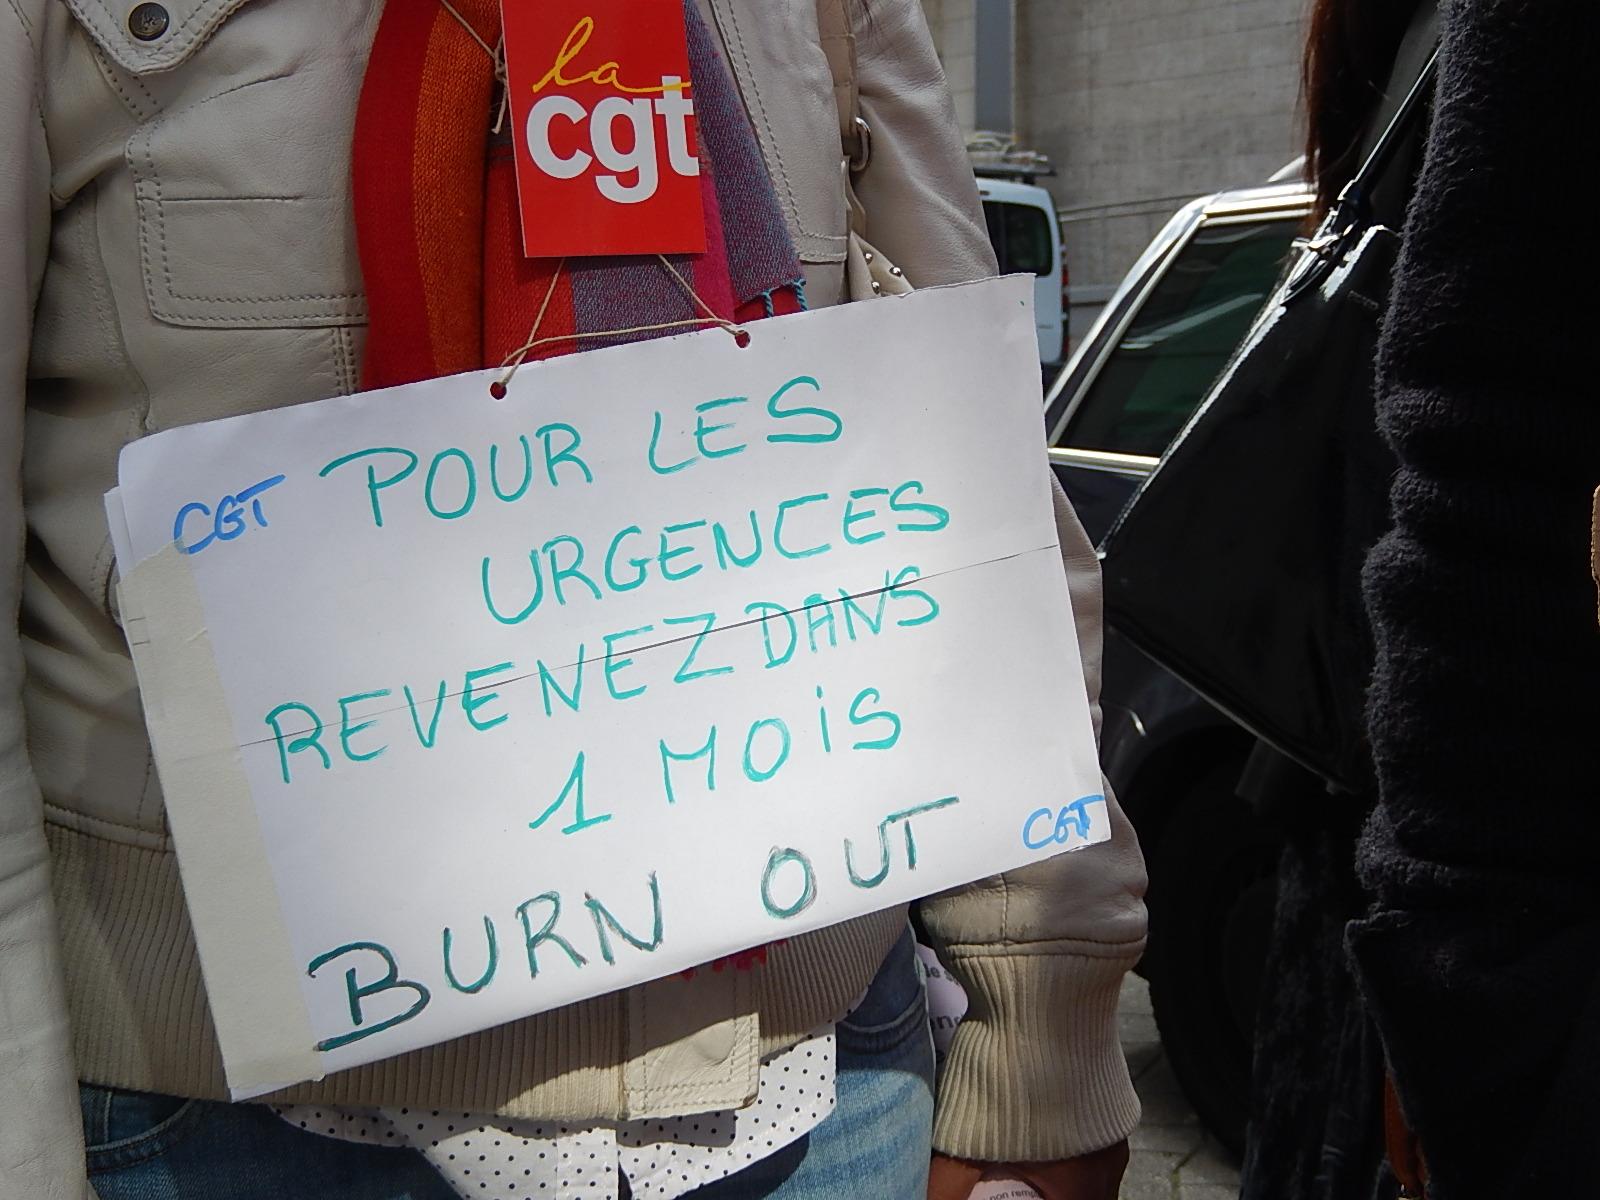 burn_out_f2c_photo